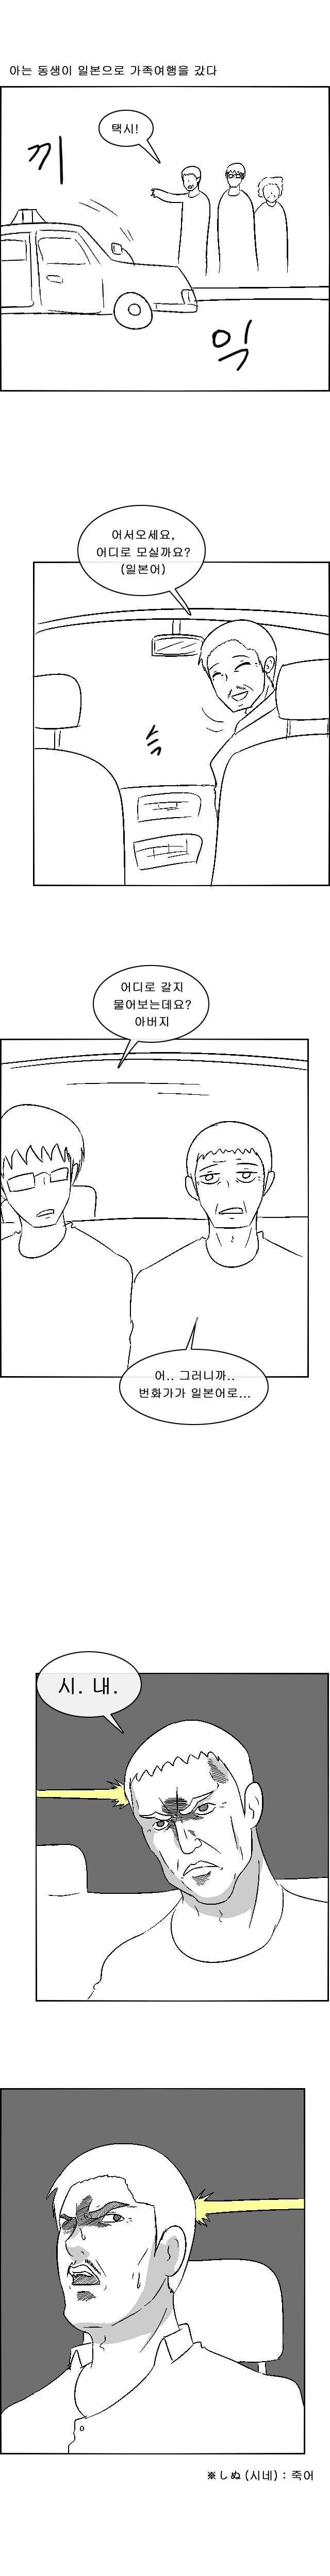 kmWhW[1].jpg 아는 동생이 일본으로 가족여행을 갔다.manhwa